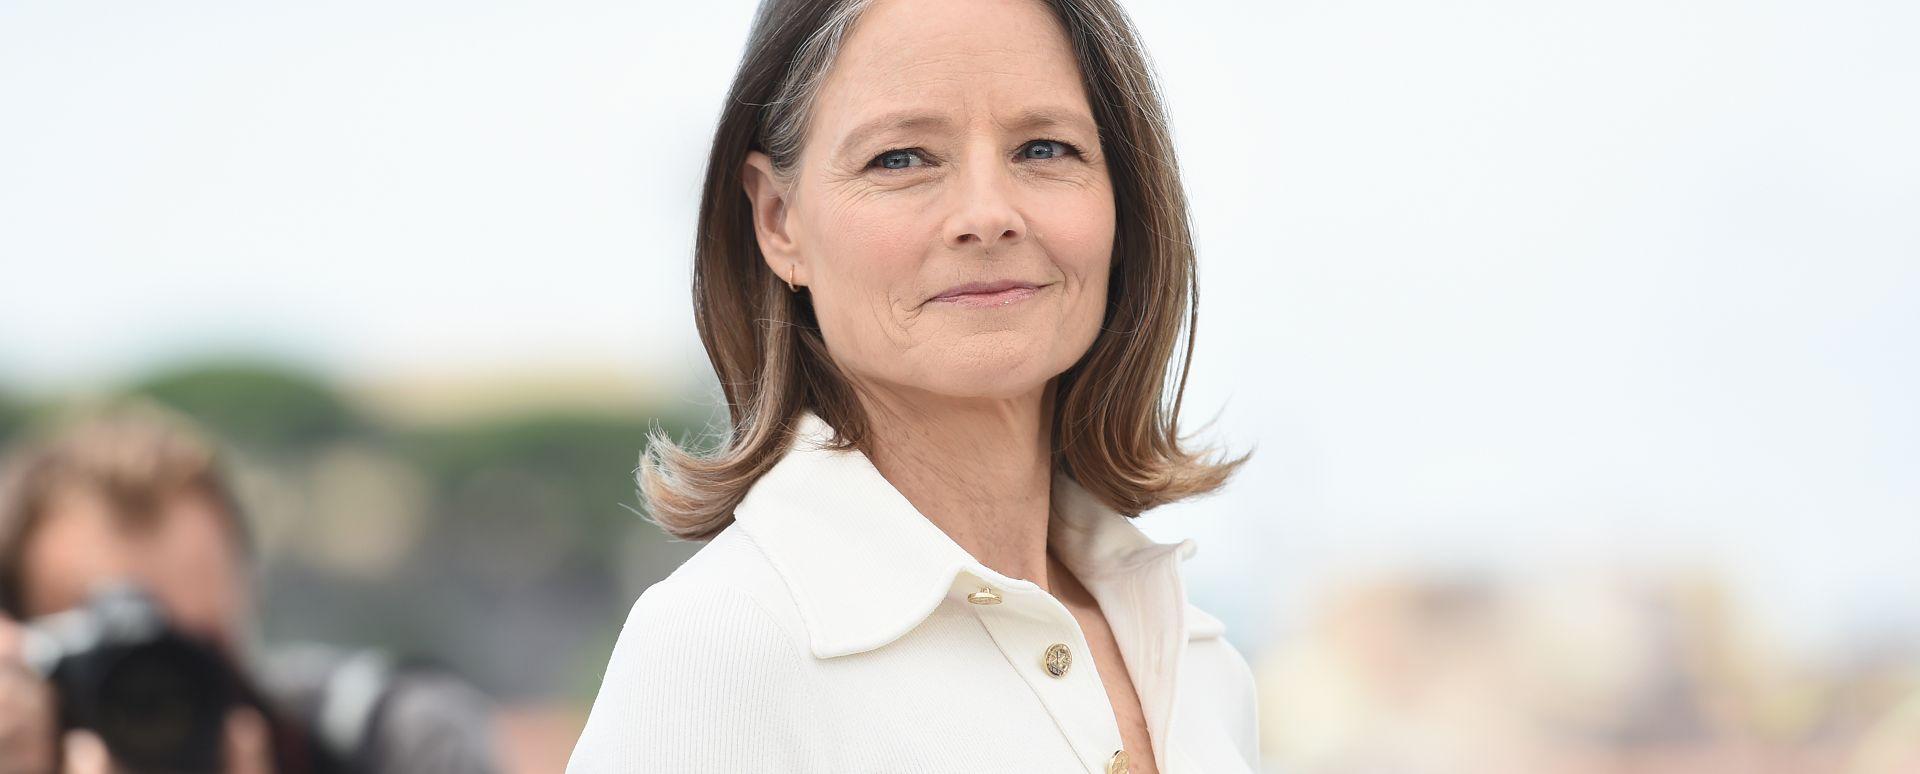 Jodie Foster w Cannes, 2021